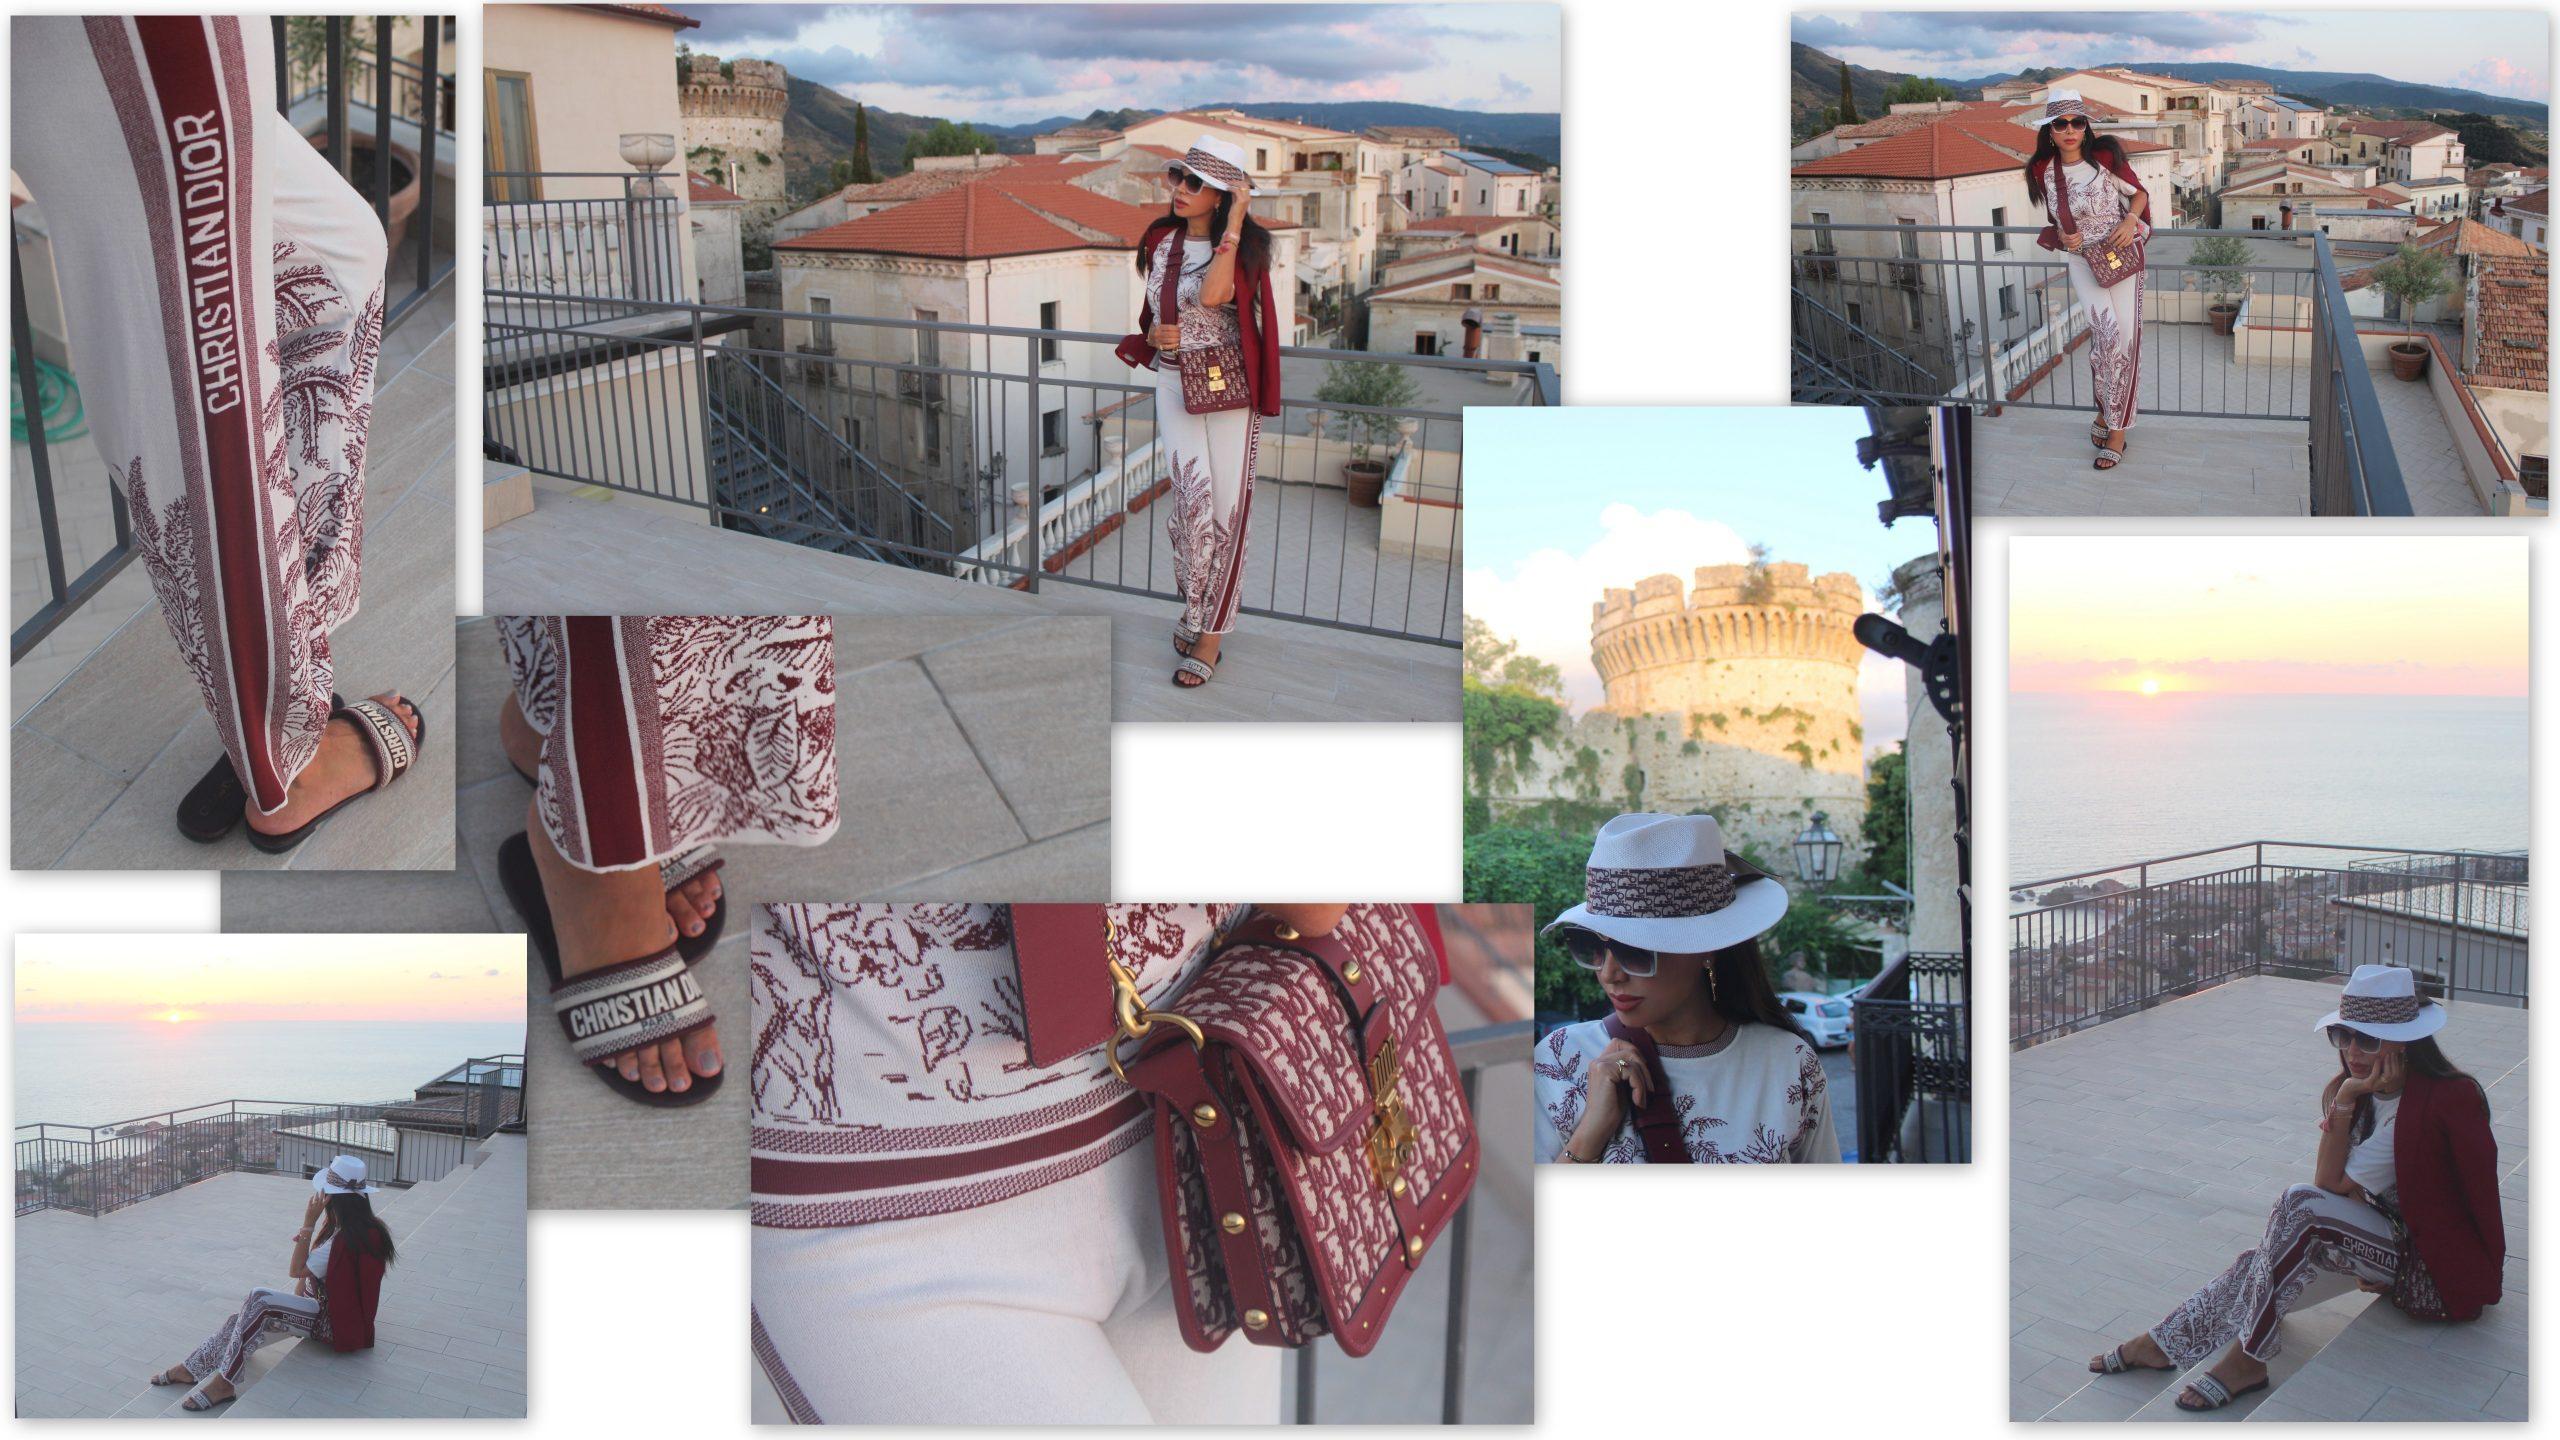 Fall 2021 Trend Burgundy and White Look Christian Dior Total Look Italian Weekend Gateaway Paola Lauretano